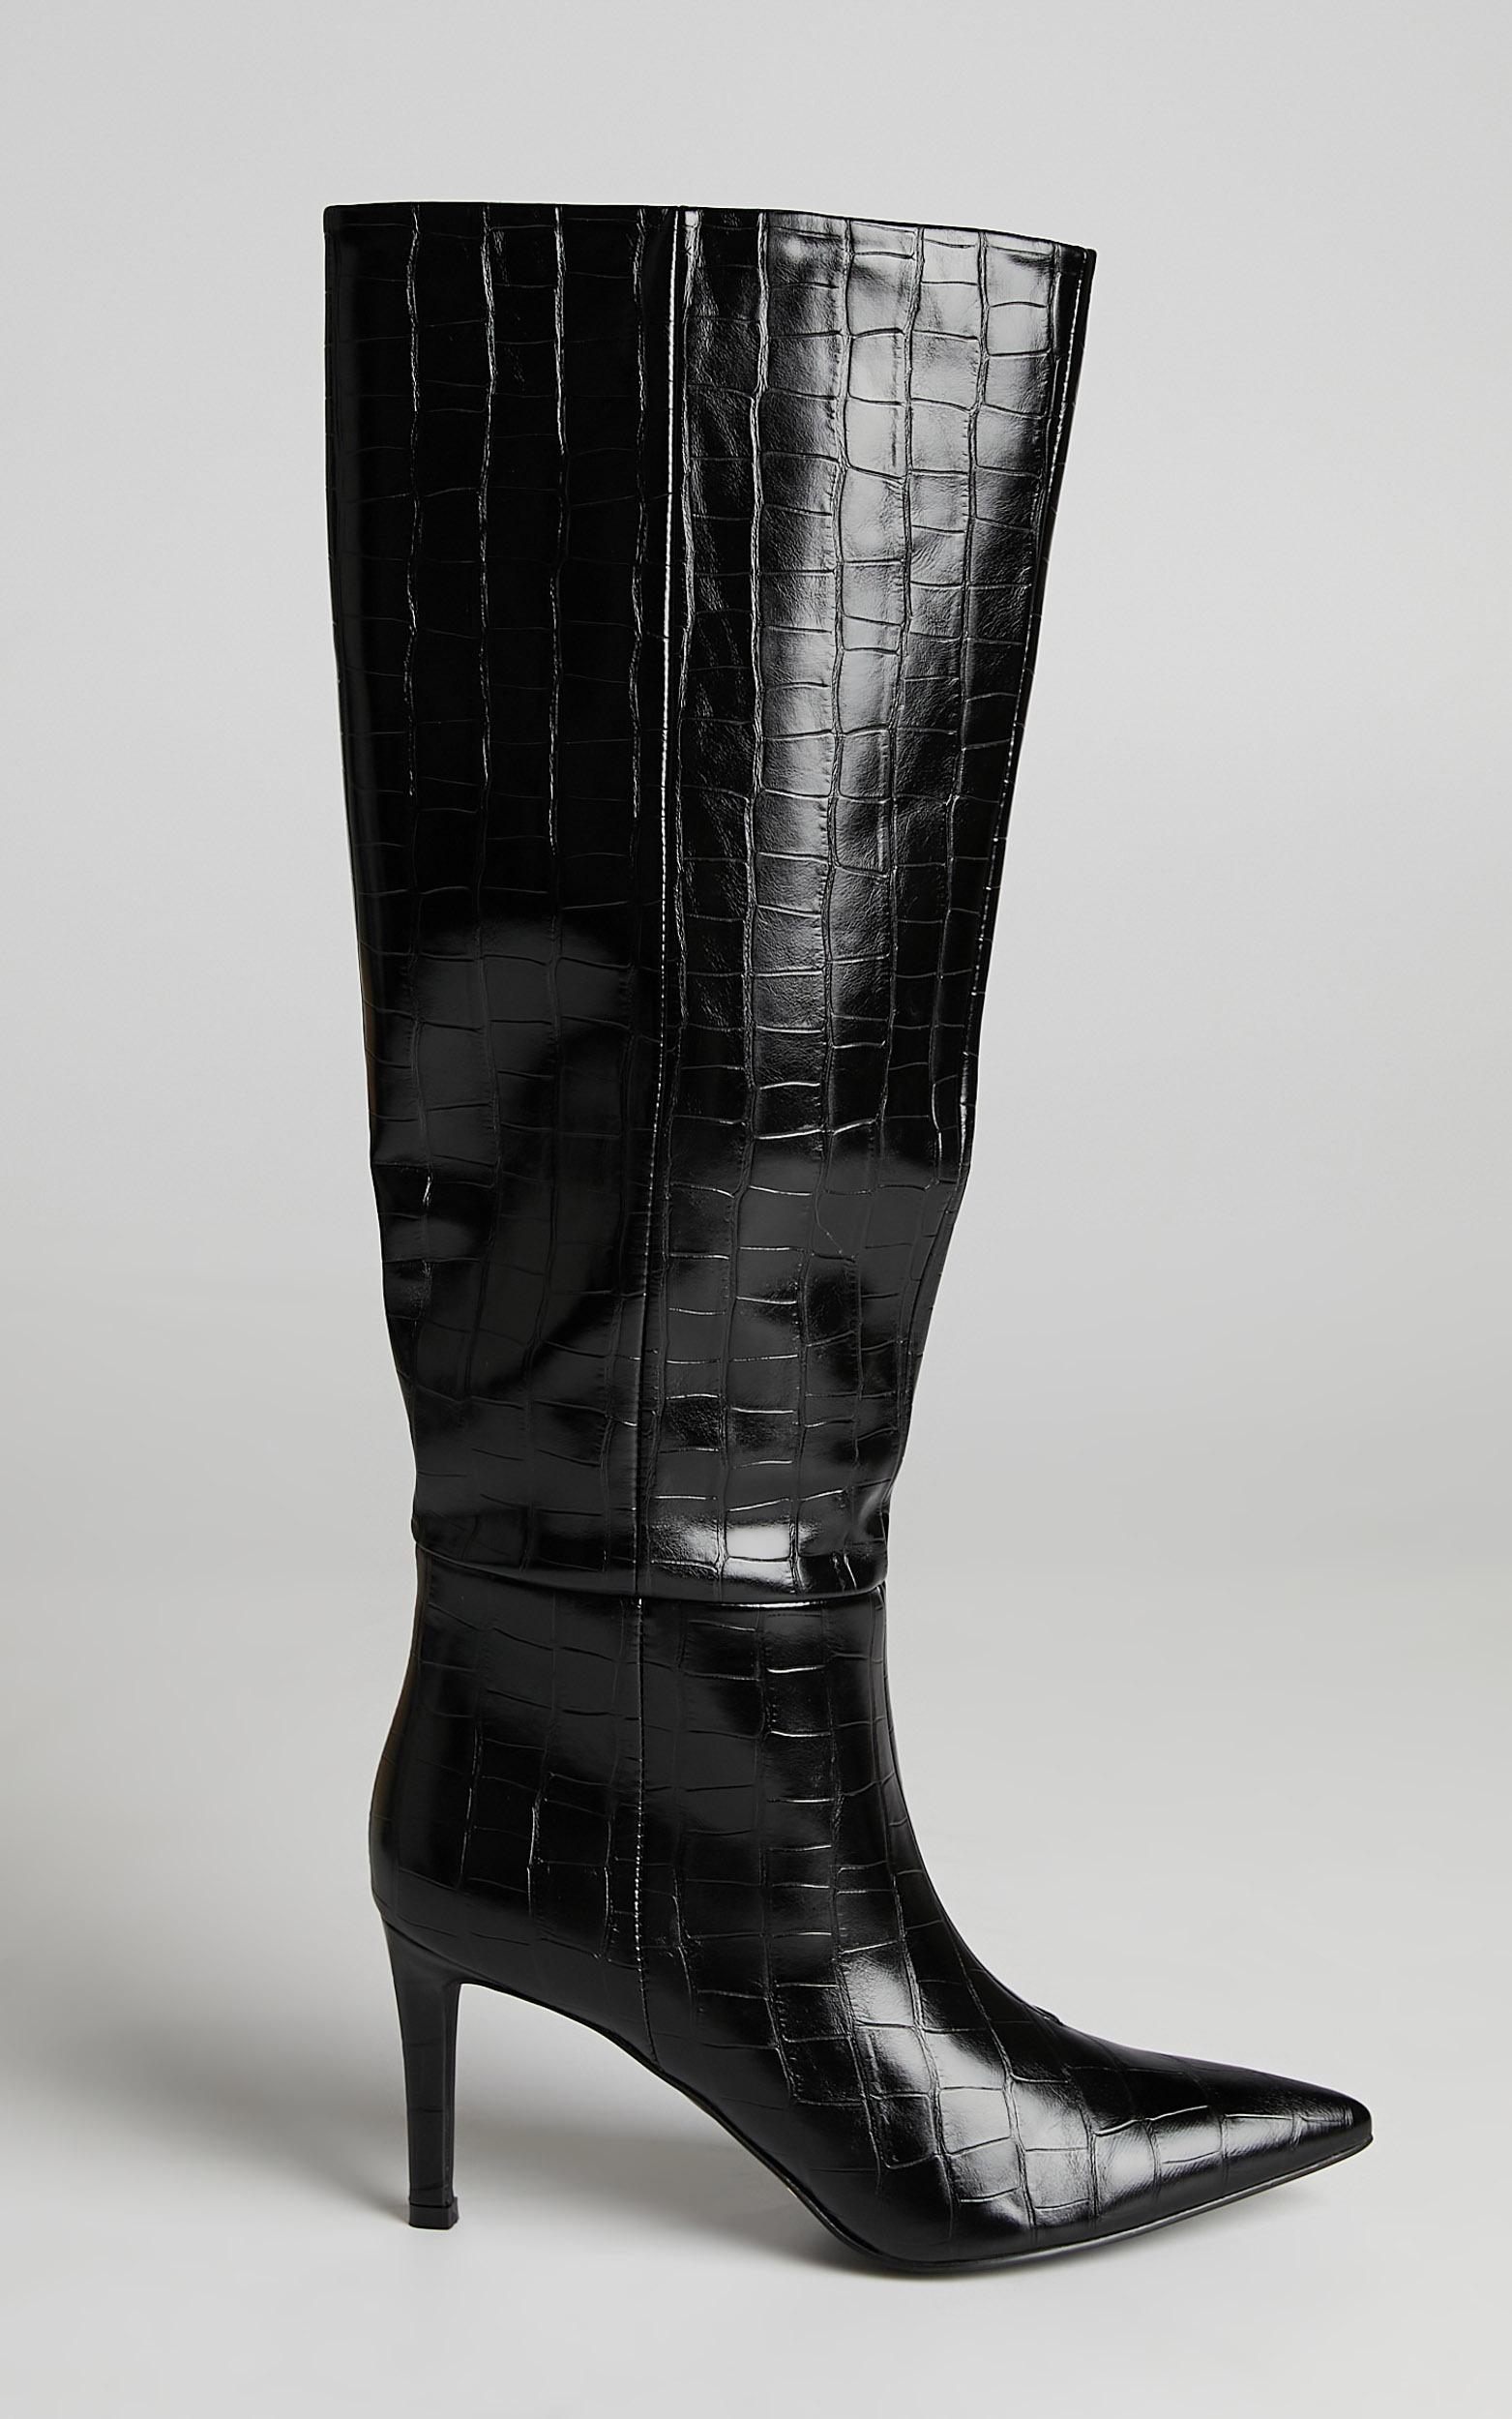 Billini - Bourbon Boots in Black Croc - 05, BLK1, hi-res image number null